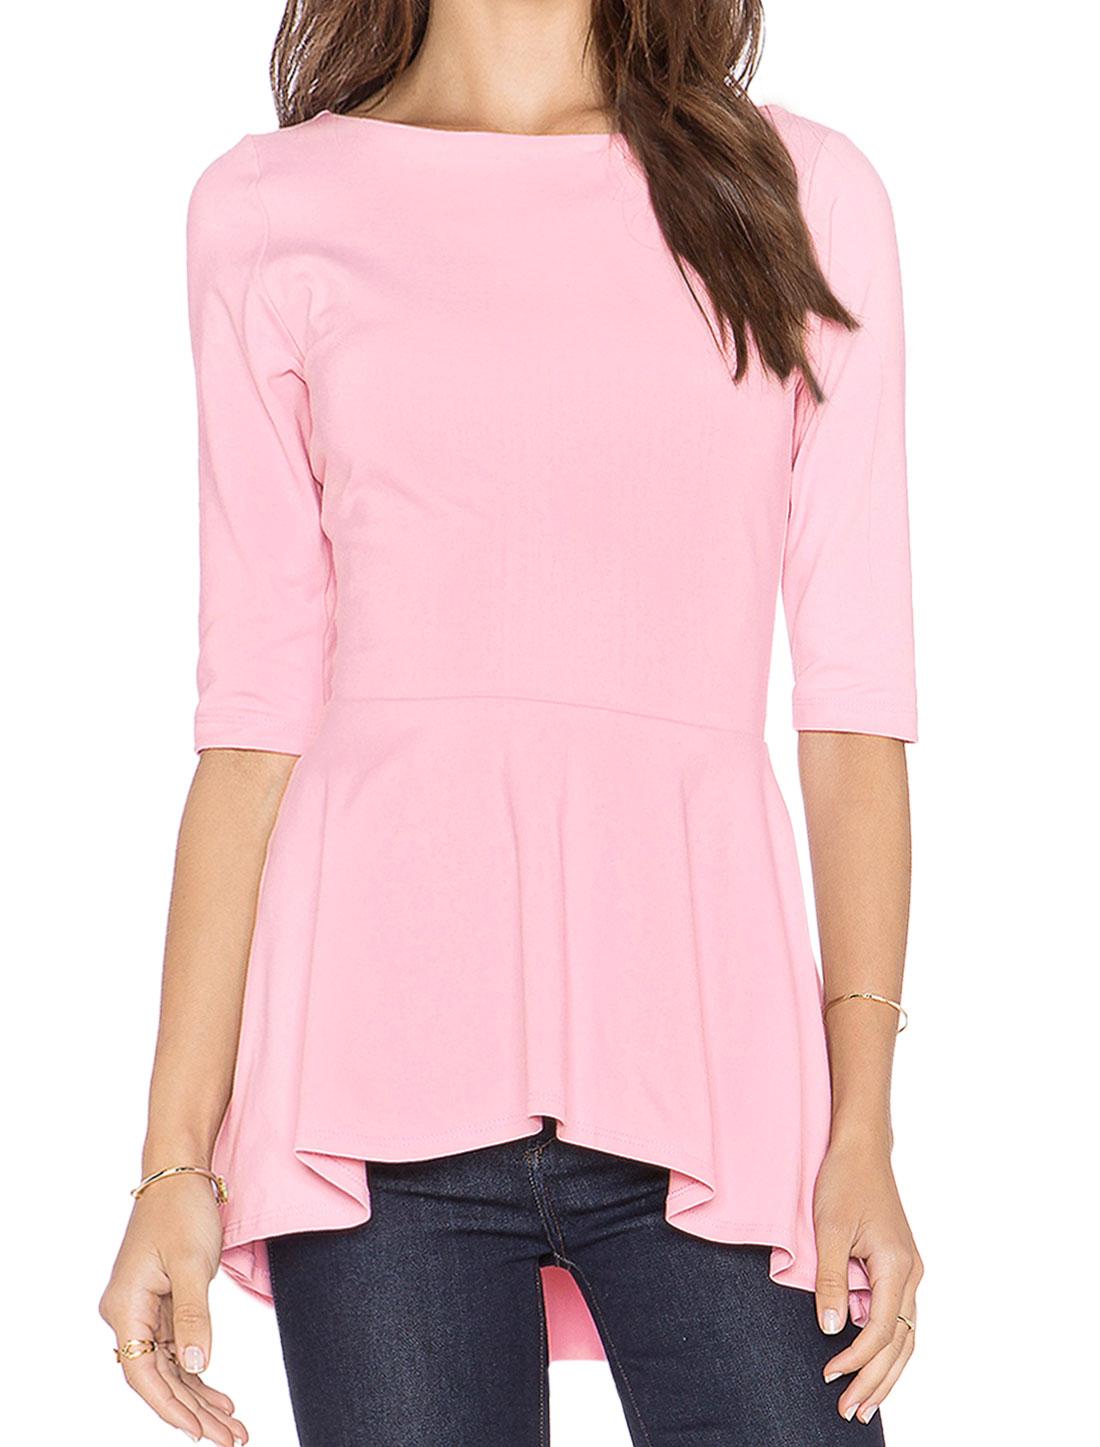 Women 1/2 Sleeves U Back Asymmetric Hem Casual Peplum Top Pink M